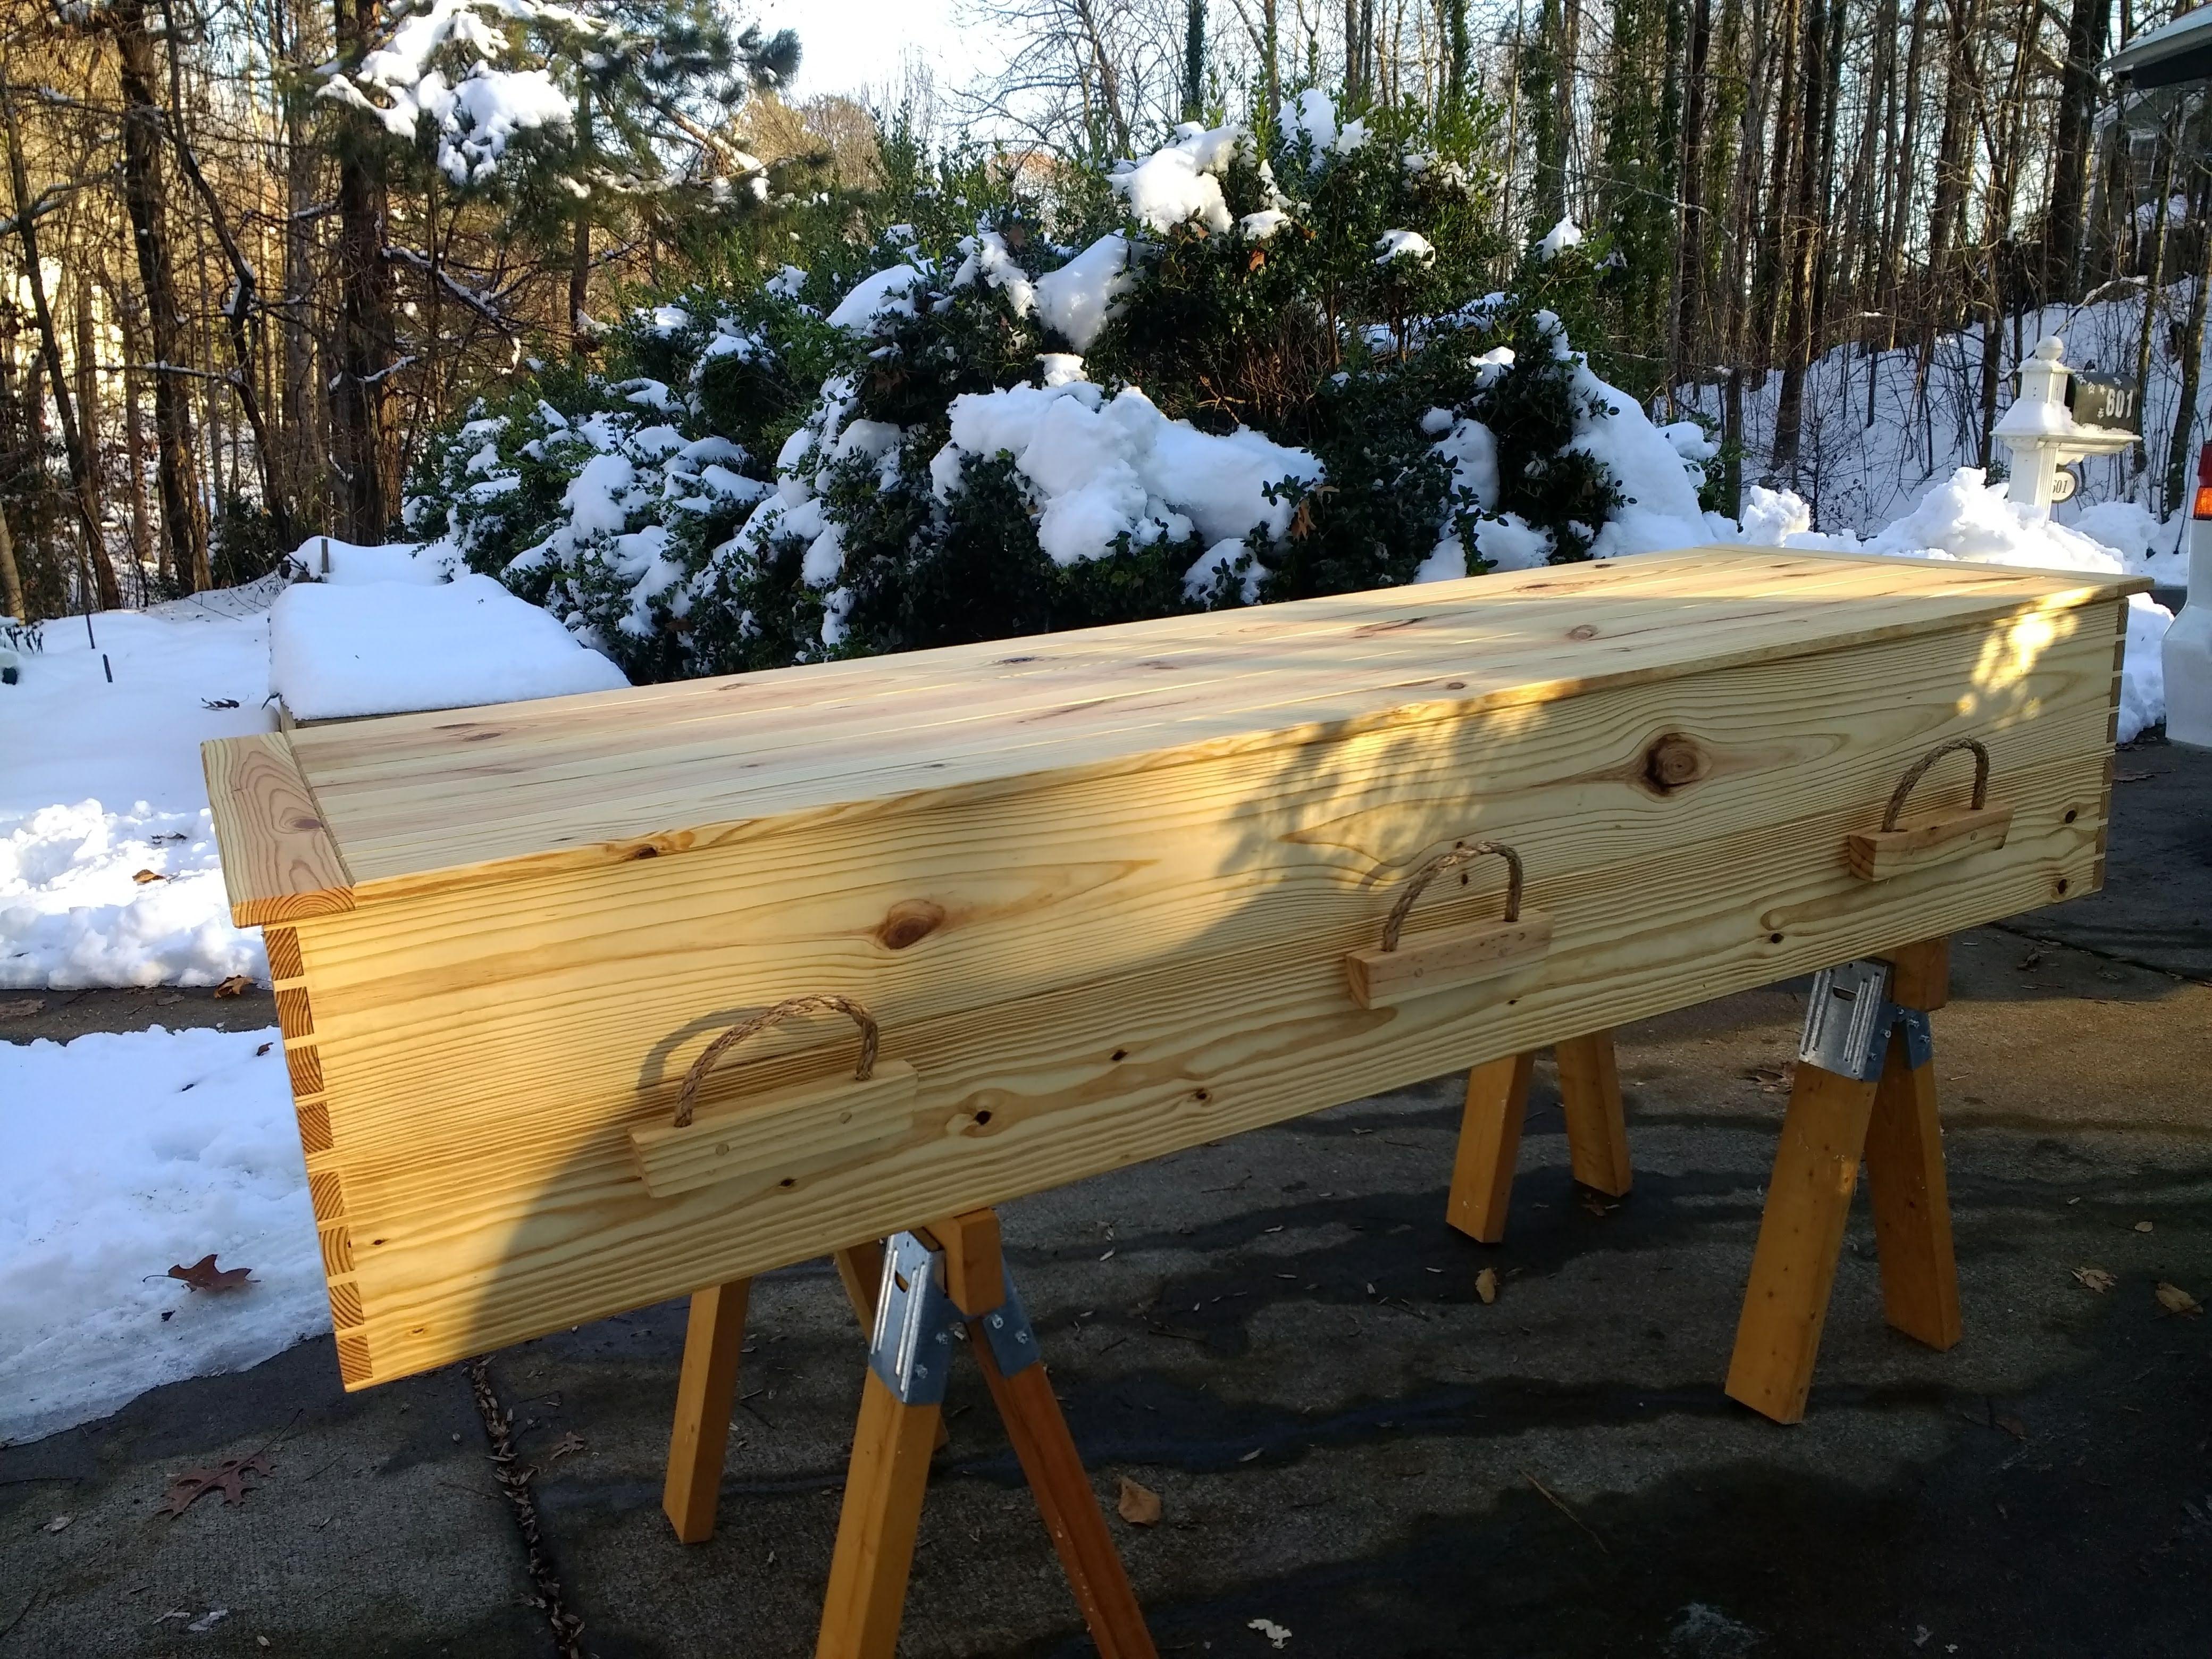 Eno River casket